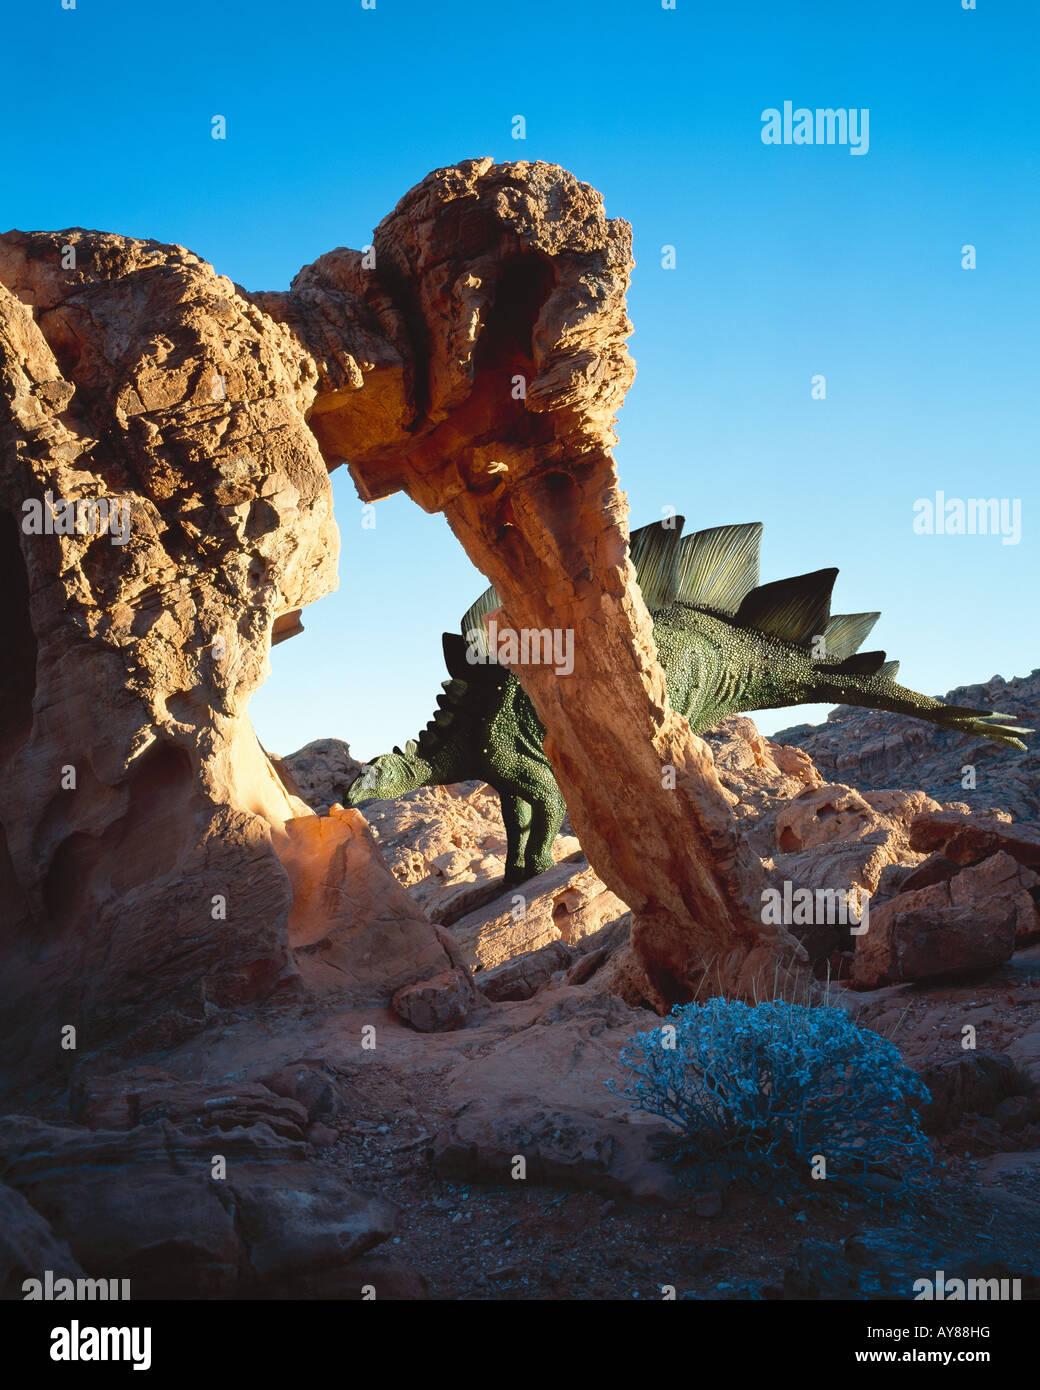 Stegosaurus dinosaur - Stock Image